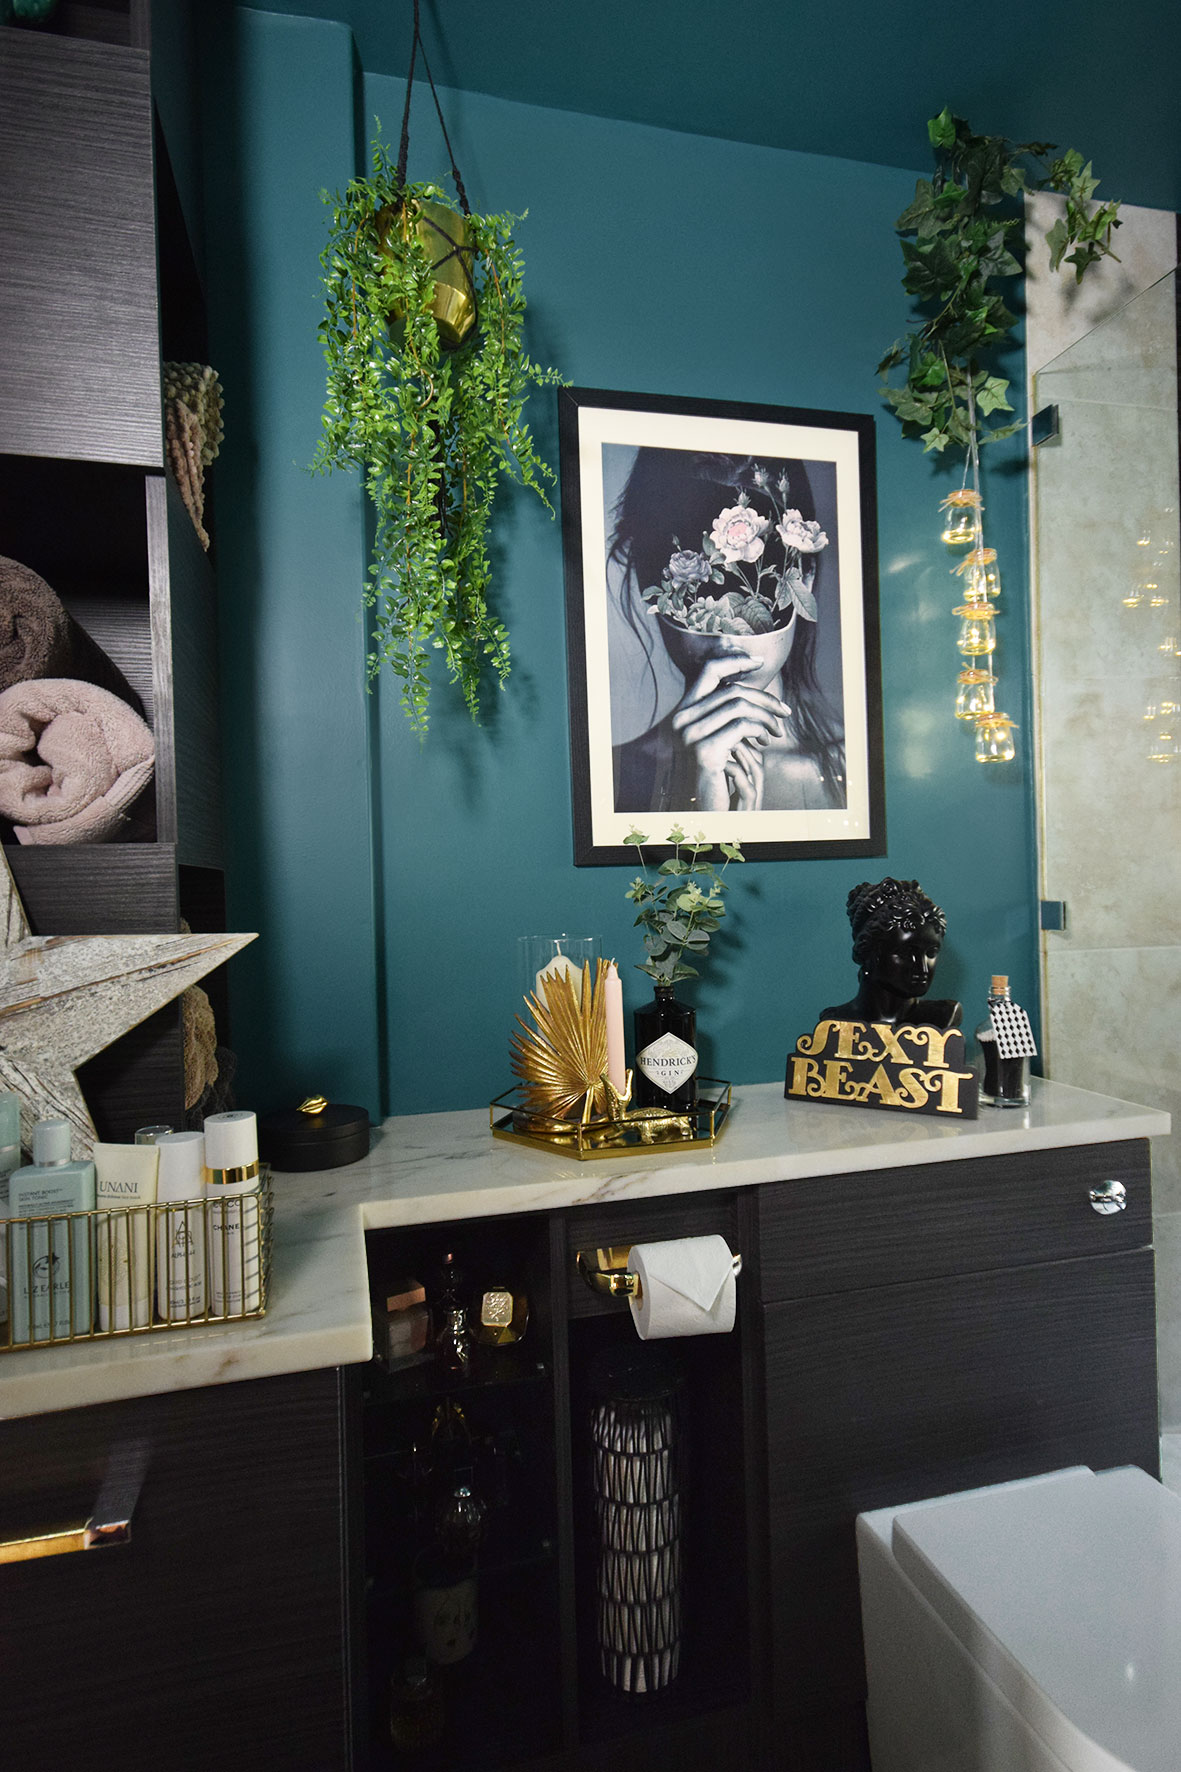 Caradise & Luxury Teal Master Bathroom Makeover Reveal - Part 1 - Caradise